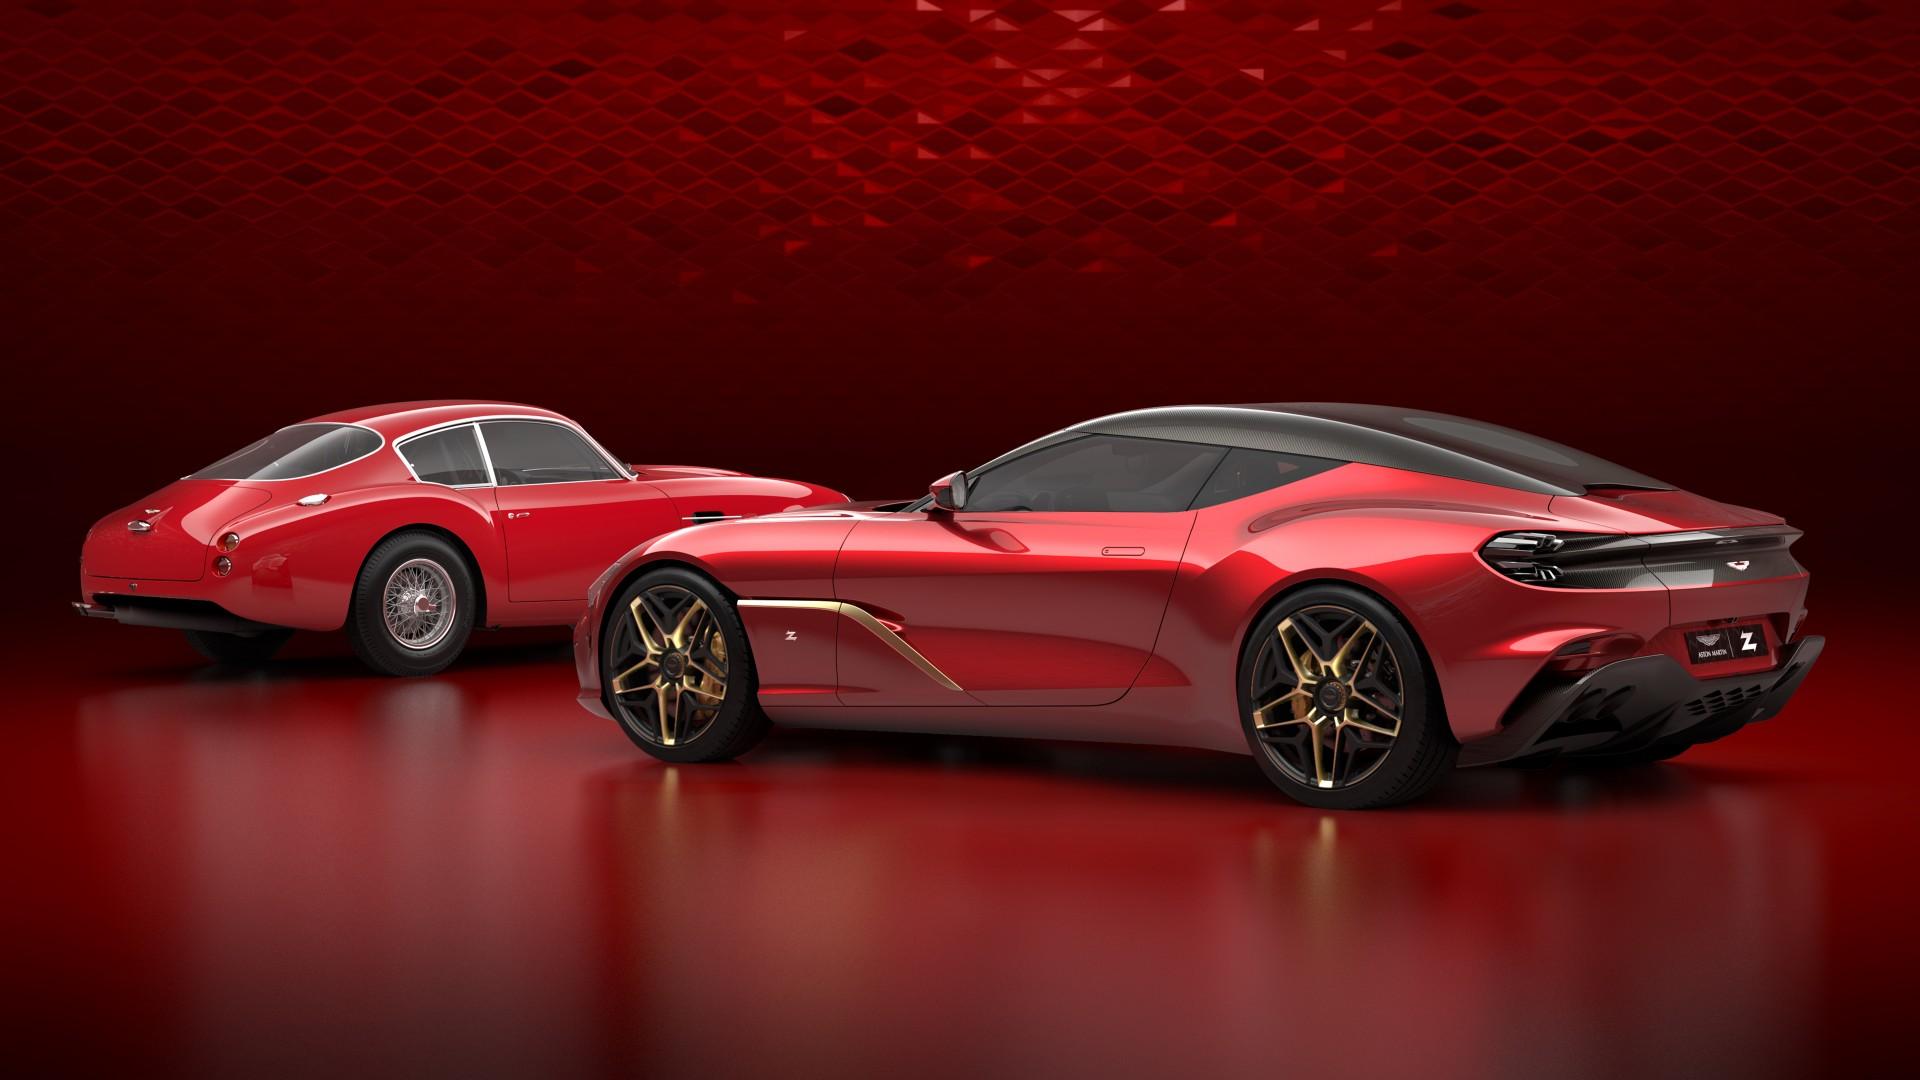 Aston Martin Dbs Gt Zagato 2019 4k 2 Wallpaper Hd Car